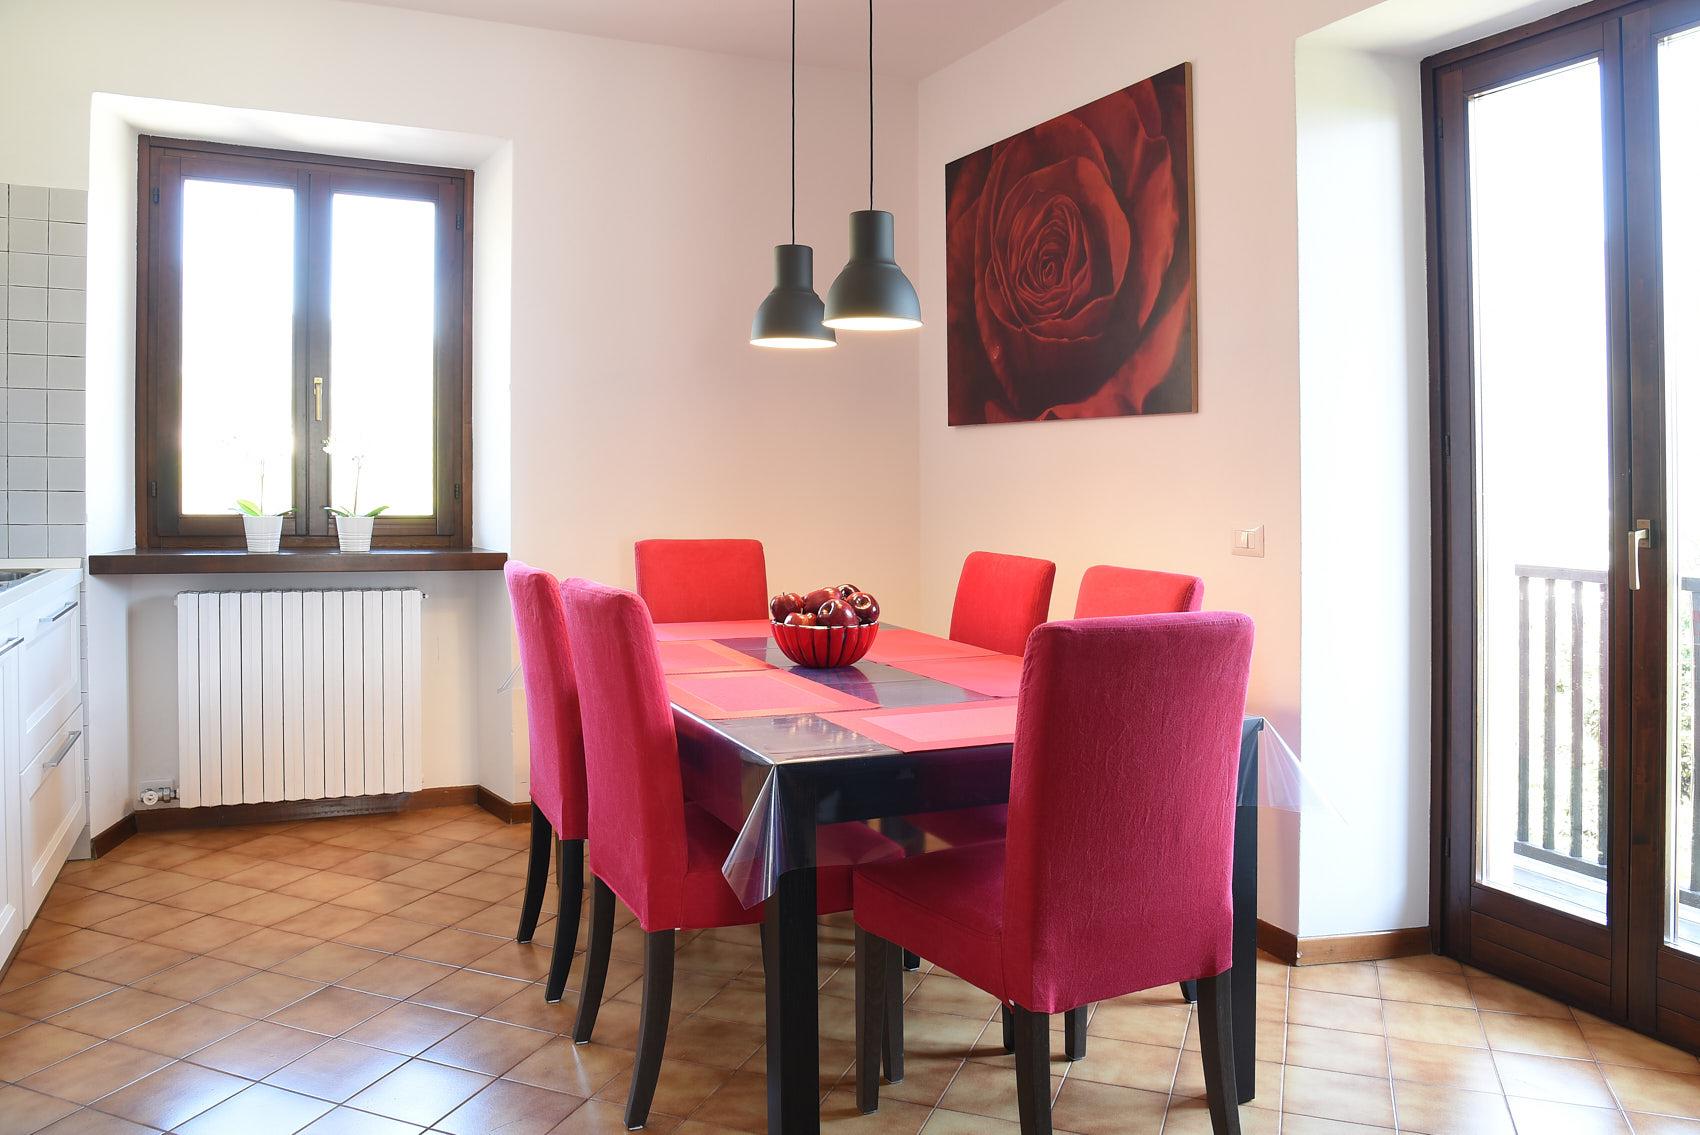 Residenza alle Grazie - Appartamenti Ai Ferrari